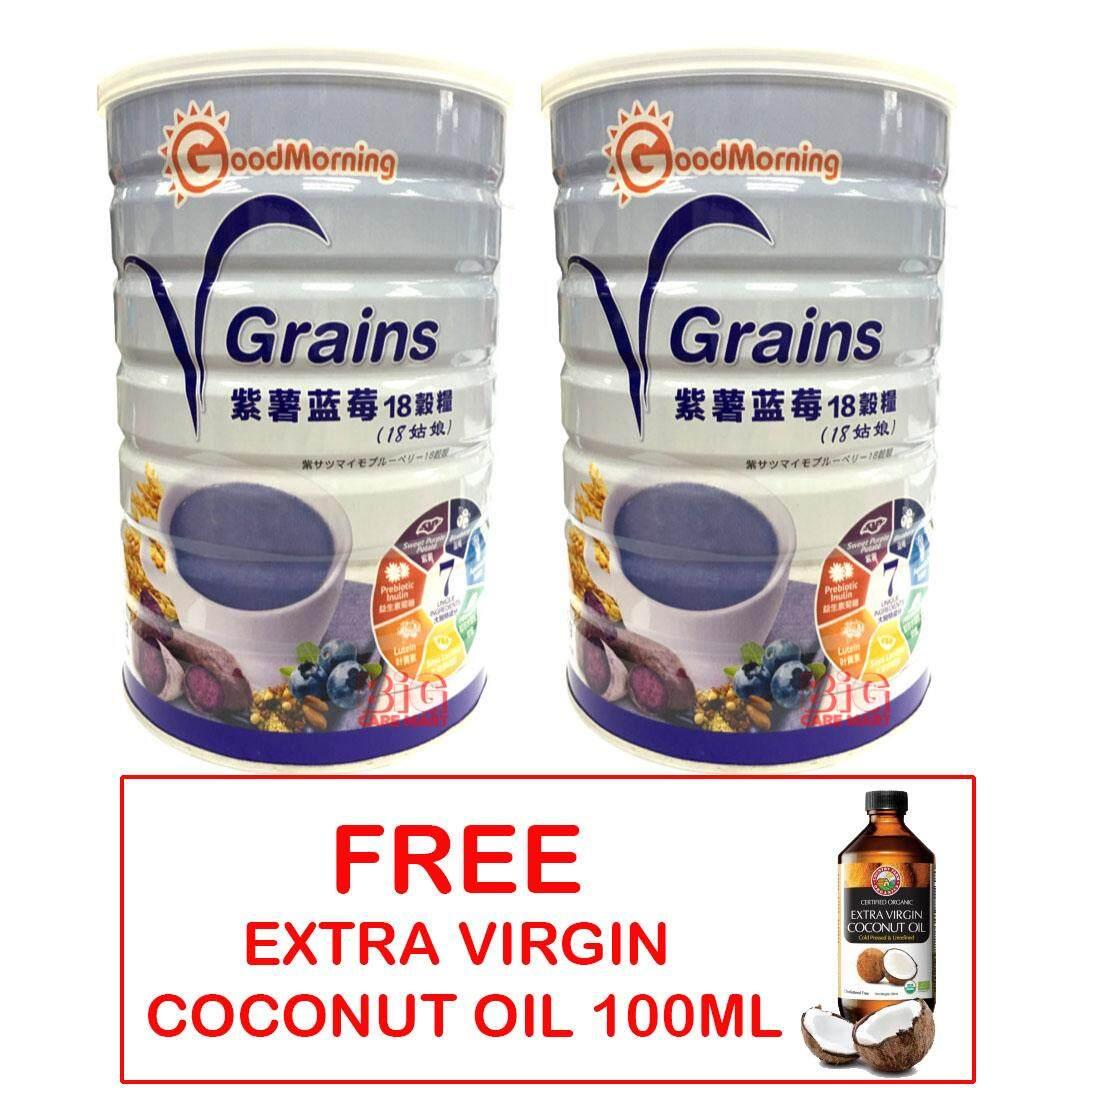 Good Morning VGrains 18 Grains 1kg x 2tins + FREE Country Farm Coconut Oil 100ml